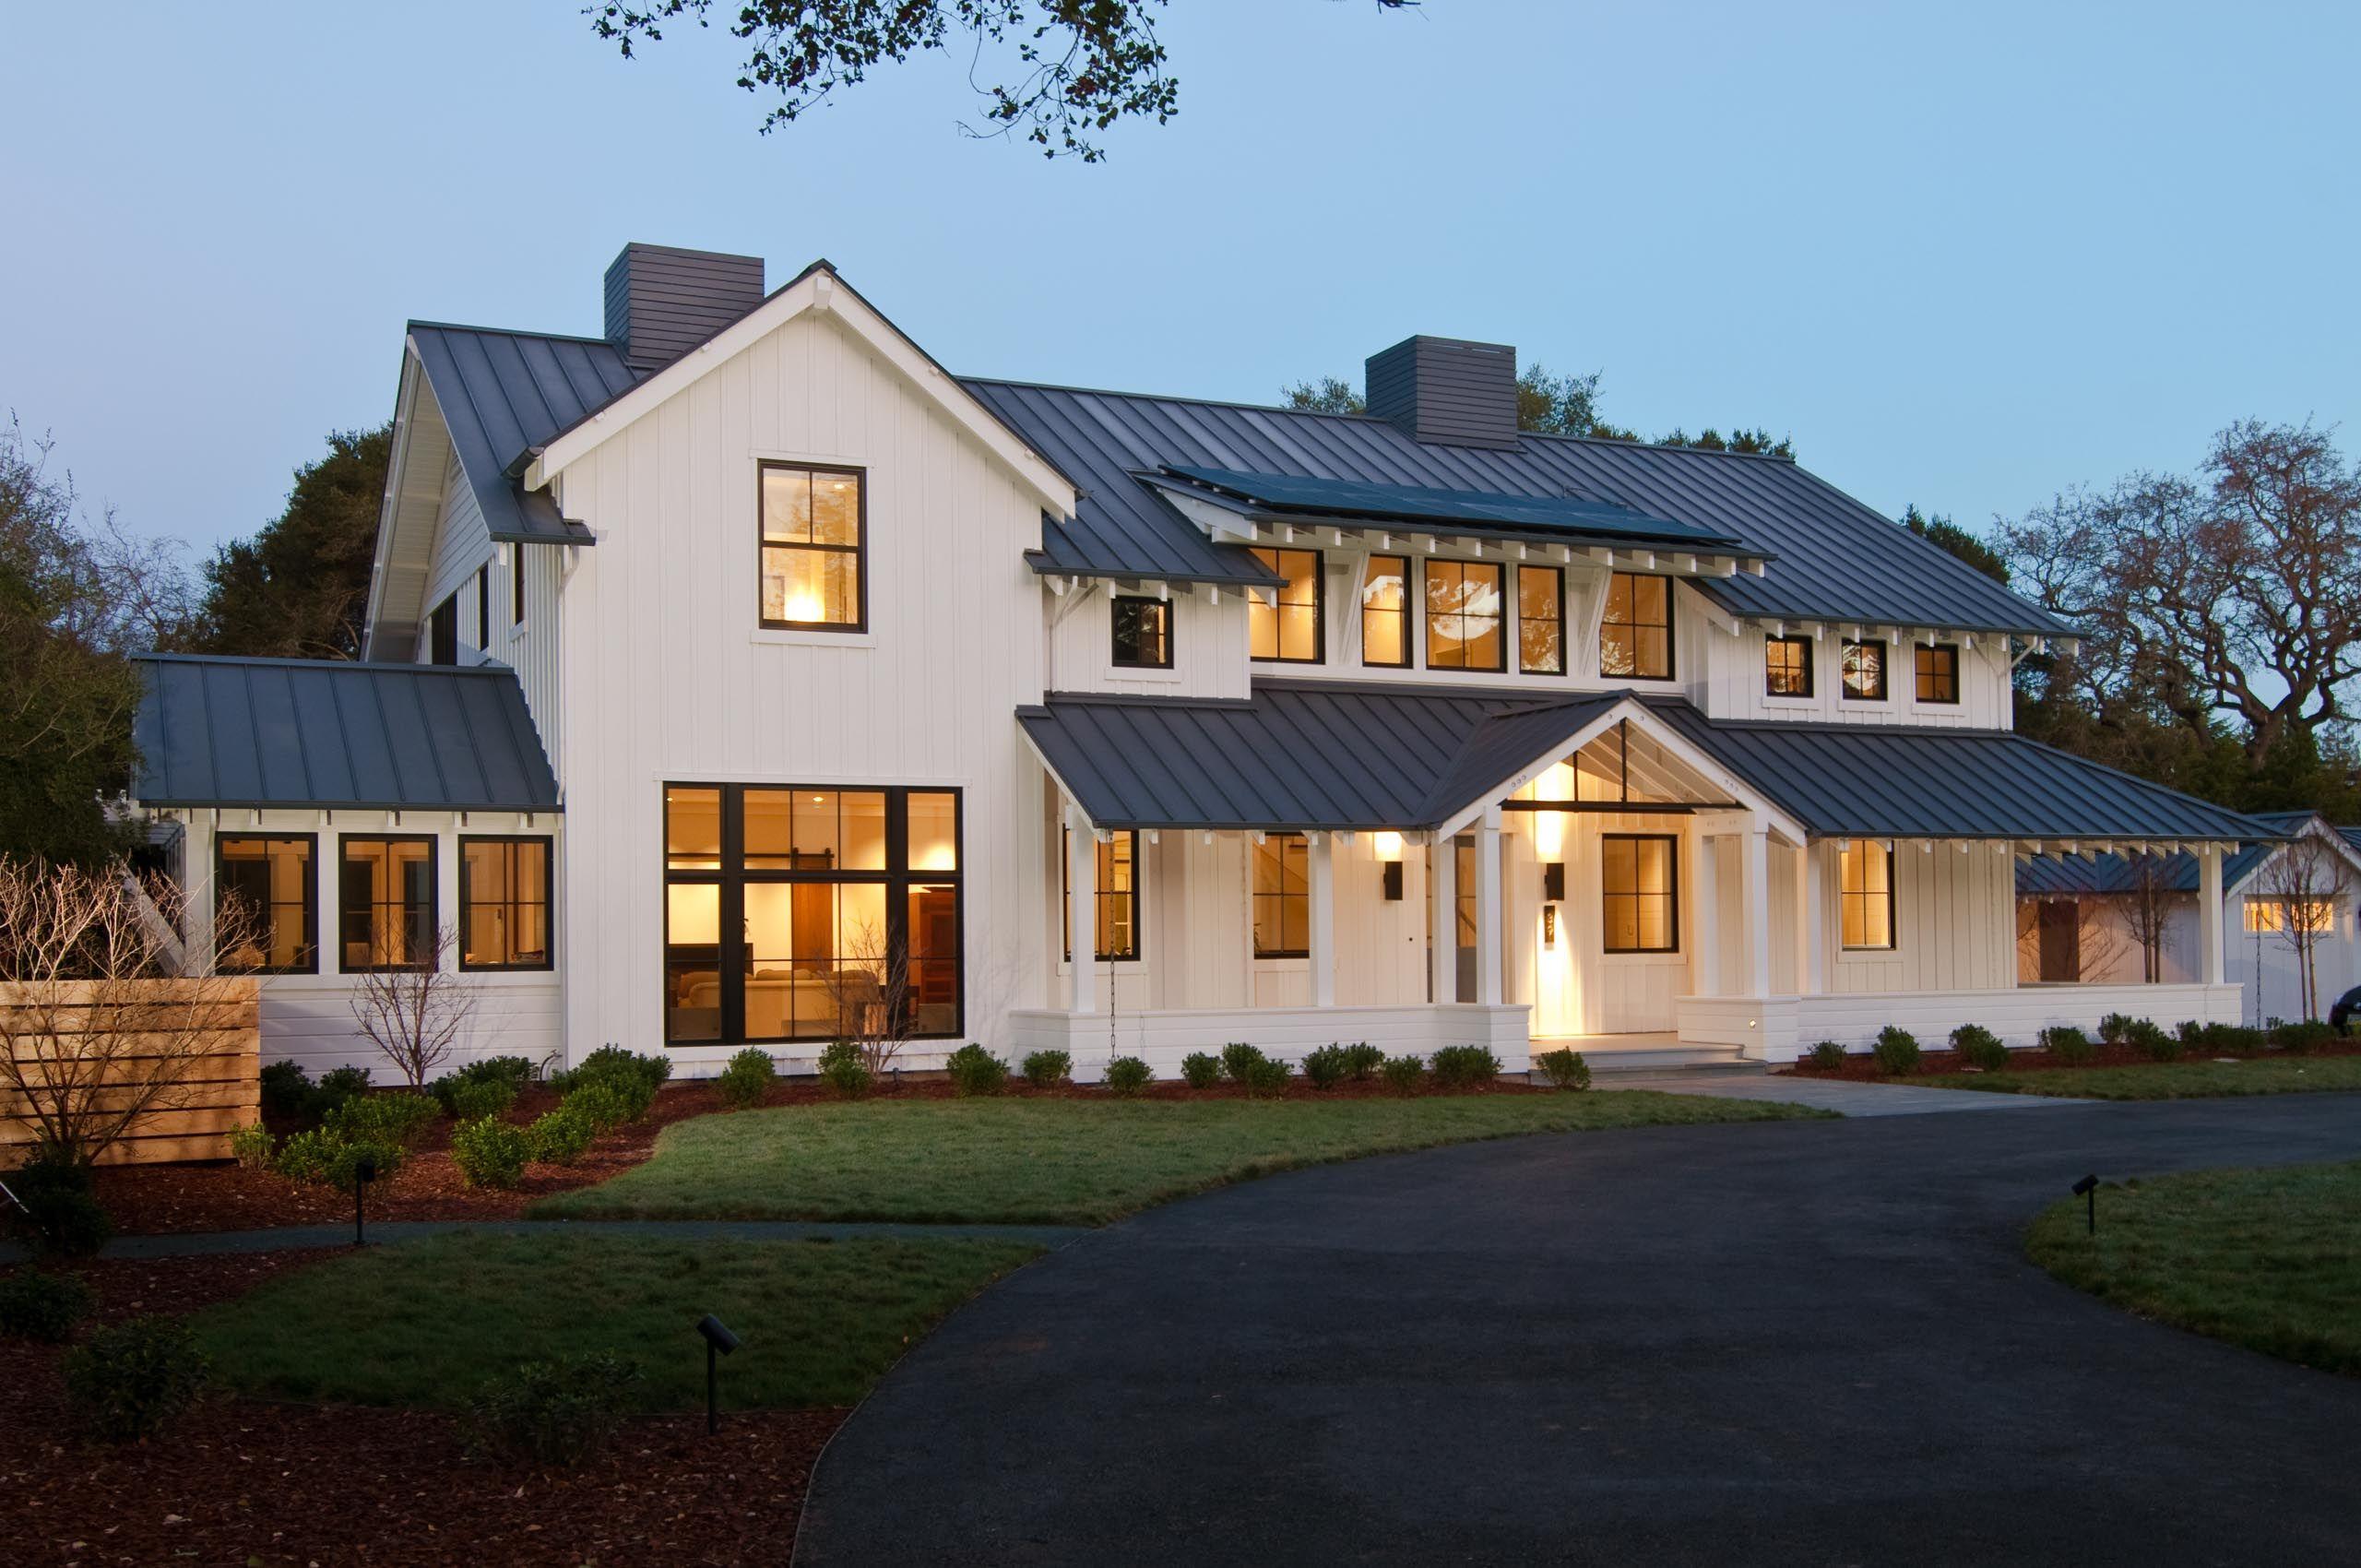 Superb 17 Best Ideas About Farmhouse Architecture On Pinterest Lake Largest Home Design Picture Inspirations Pitcheantrous